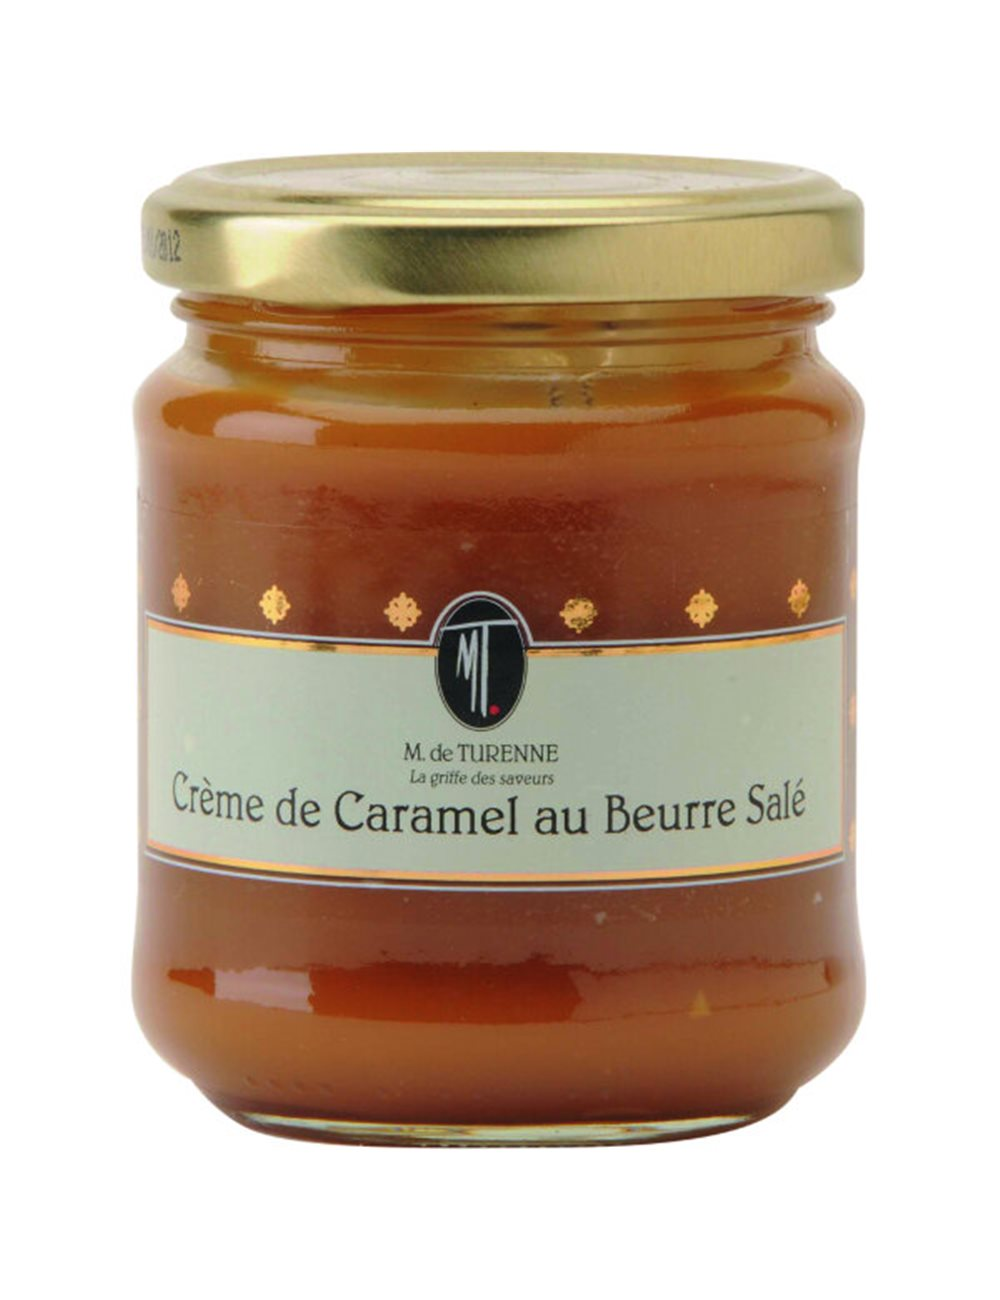 Creme De Caramel Au Beurre Sale 220g